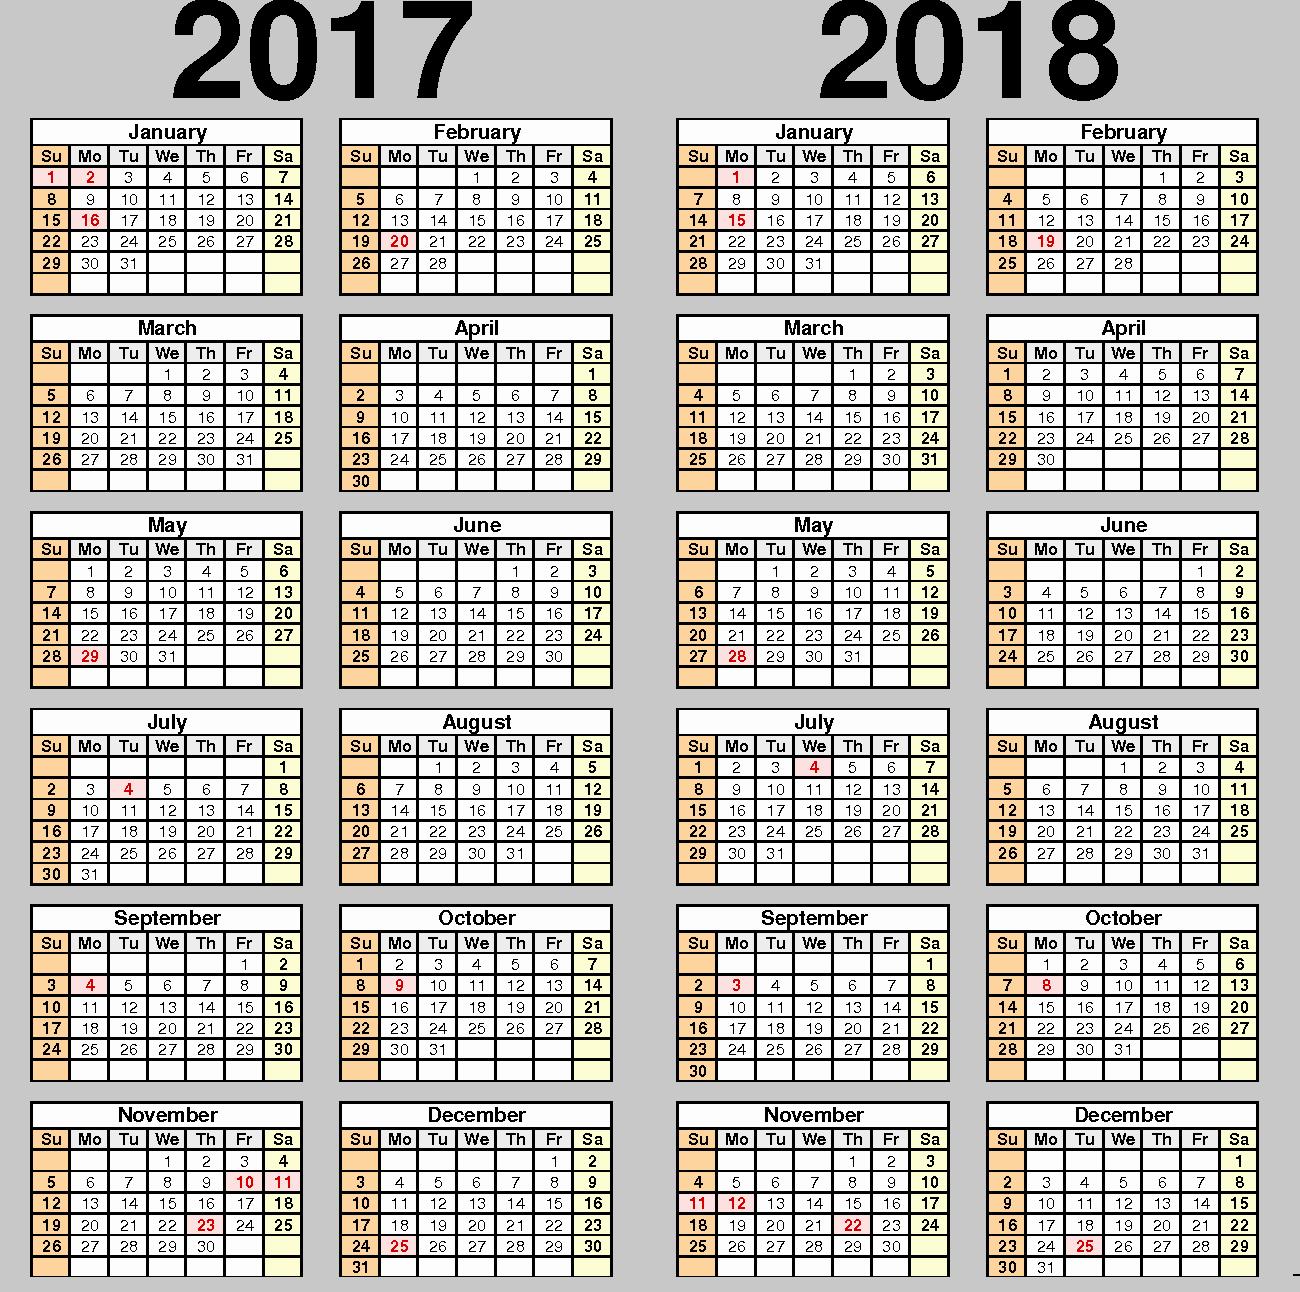 2017-2018 Printable Calendar Inspirational Printable Calendar 2017 2018 School Year